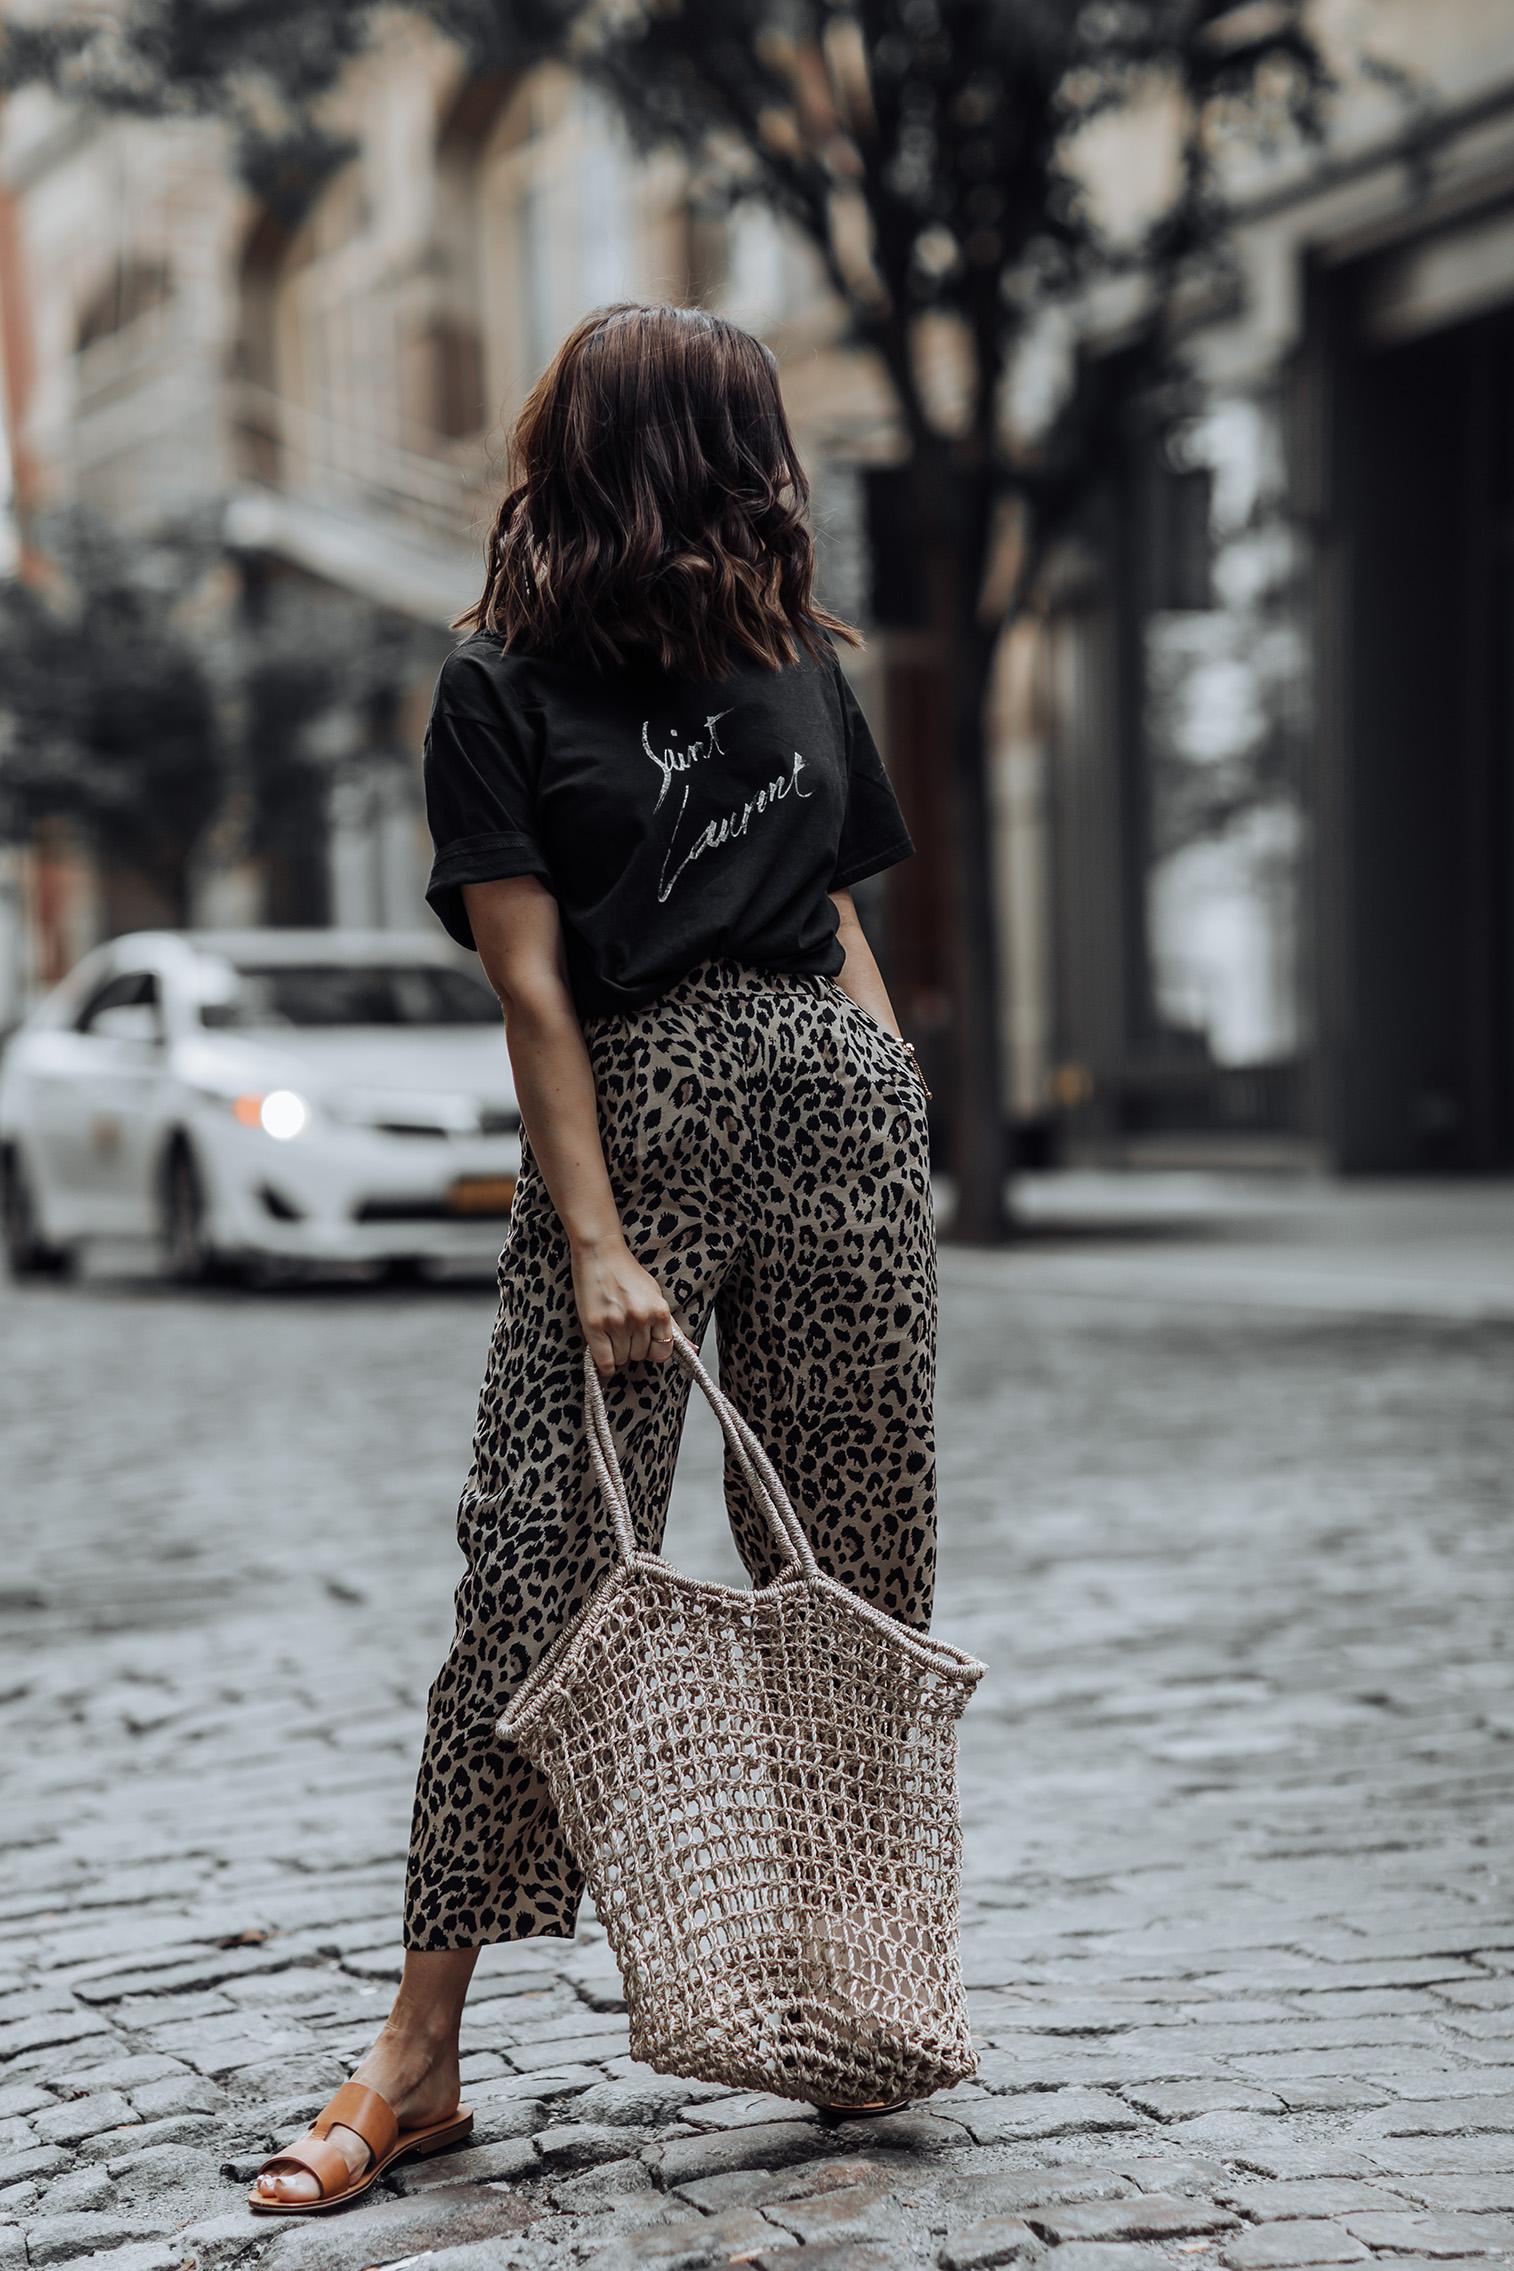 Leopard obsessed | Saint Laurent Tee | Leopard pants | Everlane Brown Slides (similar) | Basket Tote |